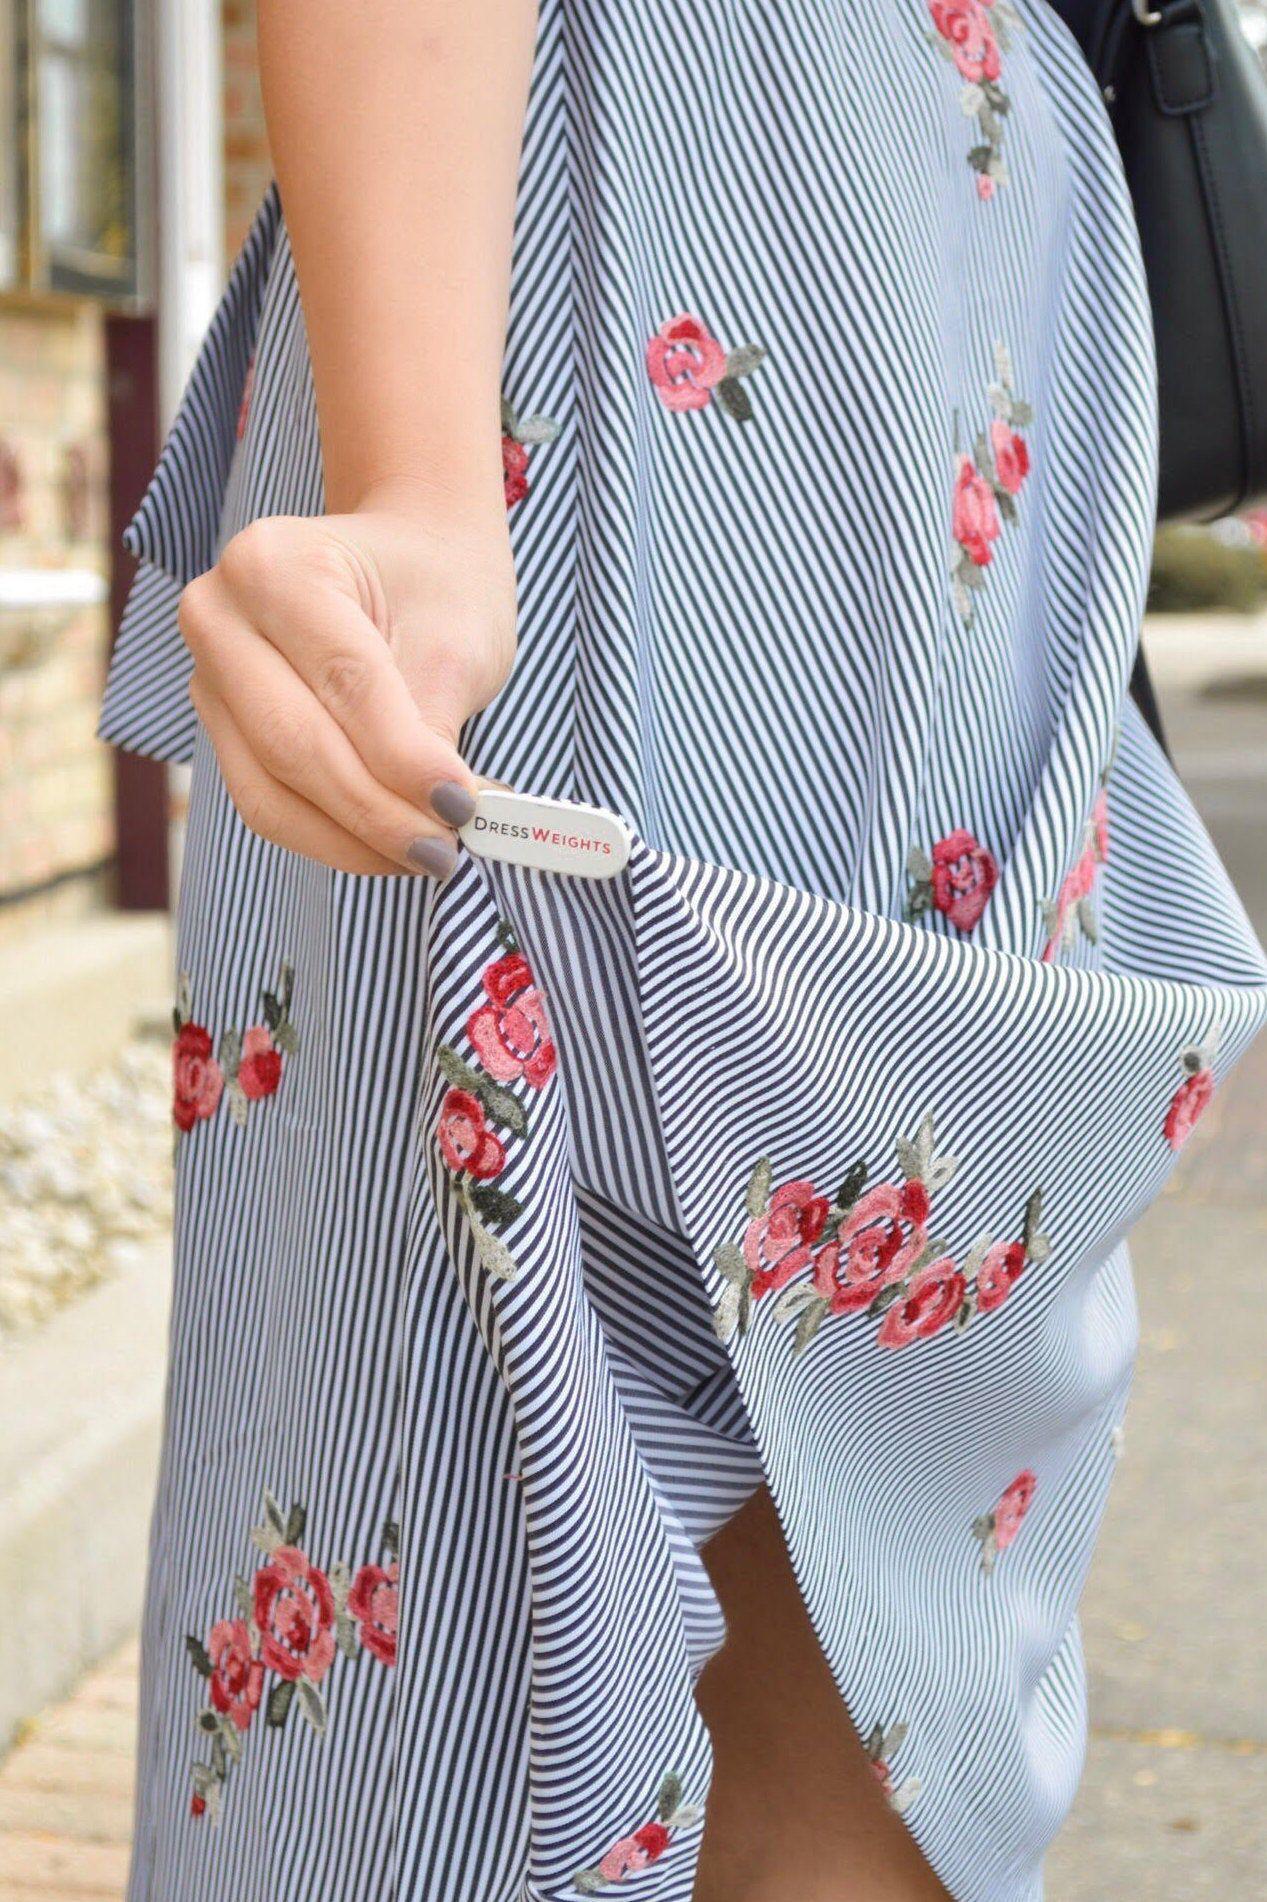 DressWeights: A Windy Day Fashion Fix | Clothing hacks ...